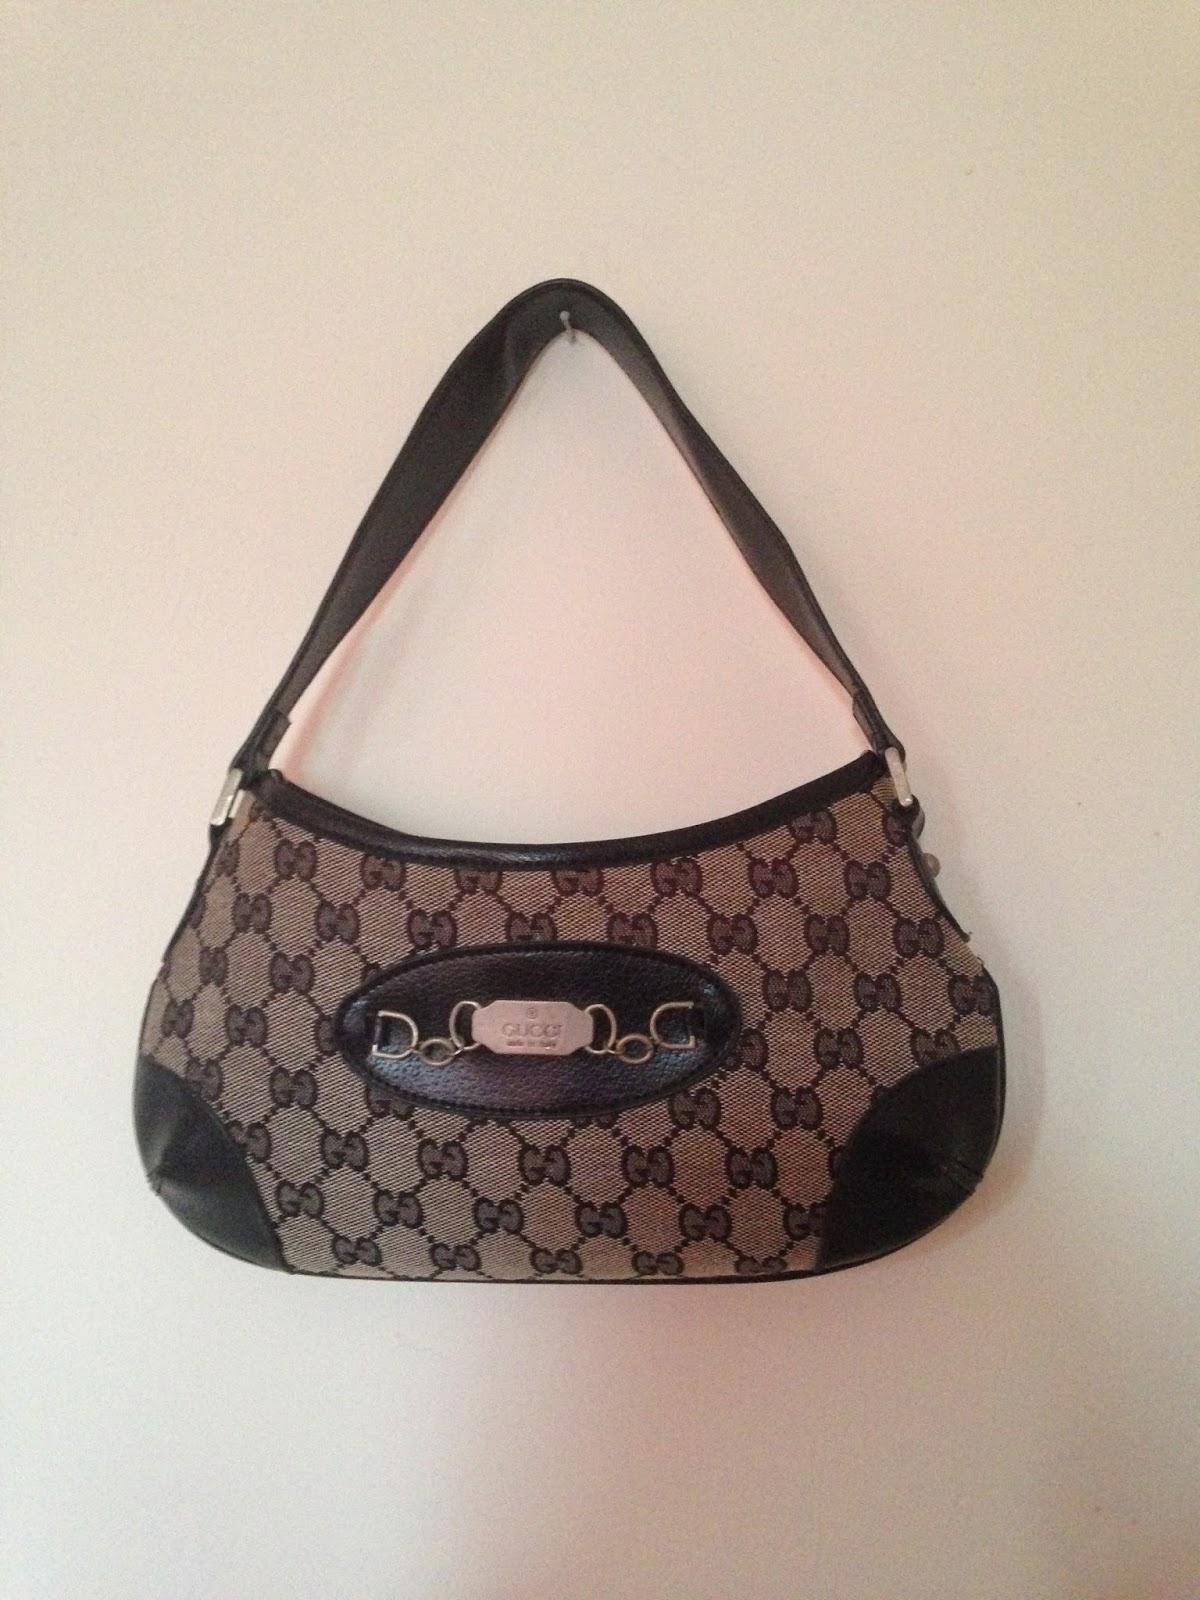 mazarashop  sold original gucci handbag